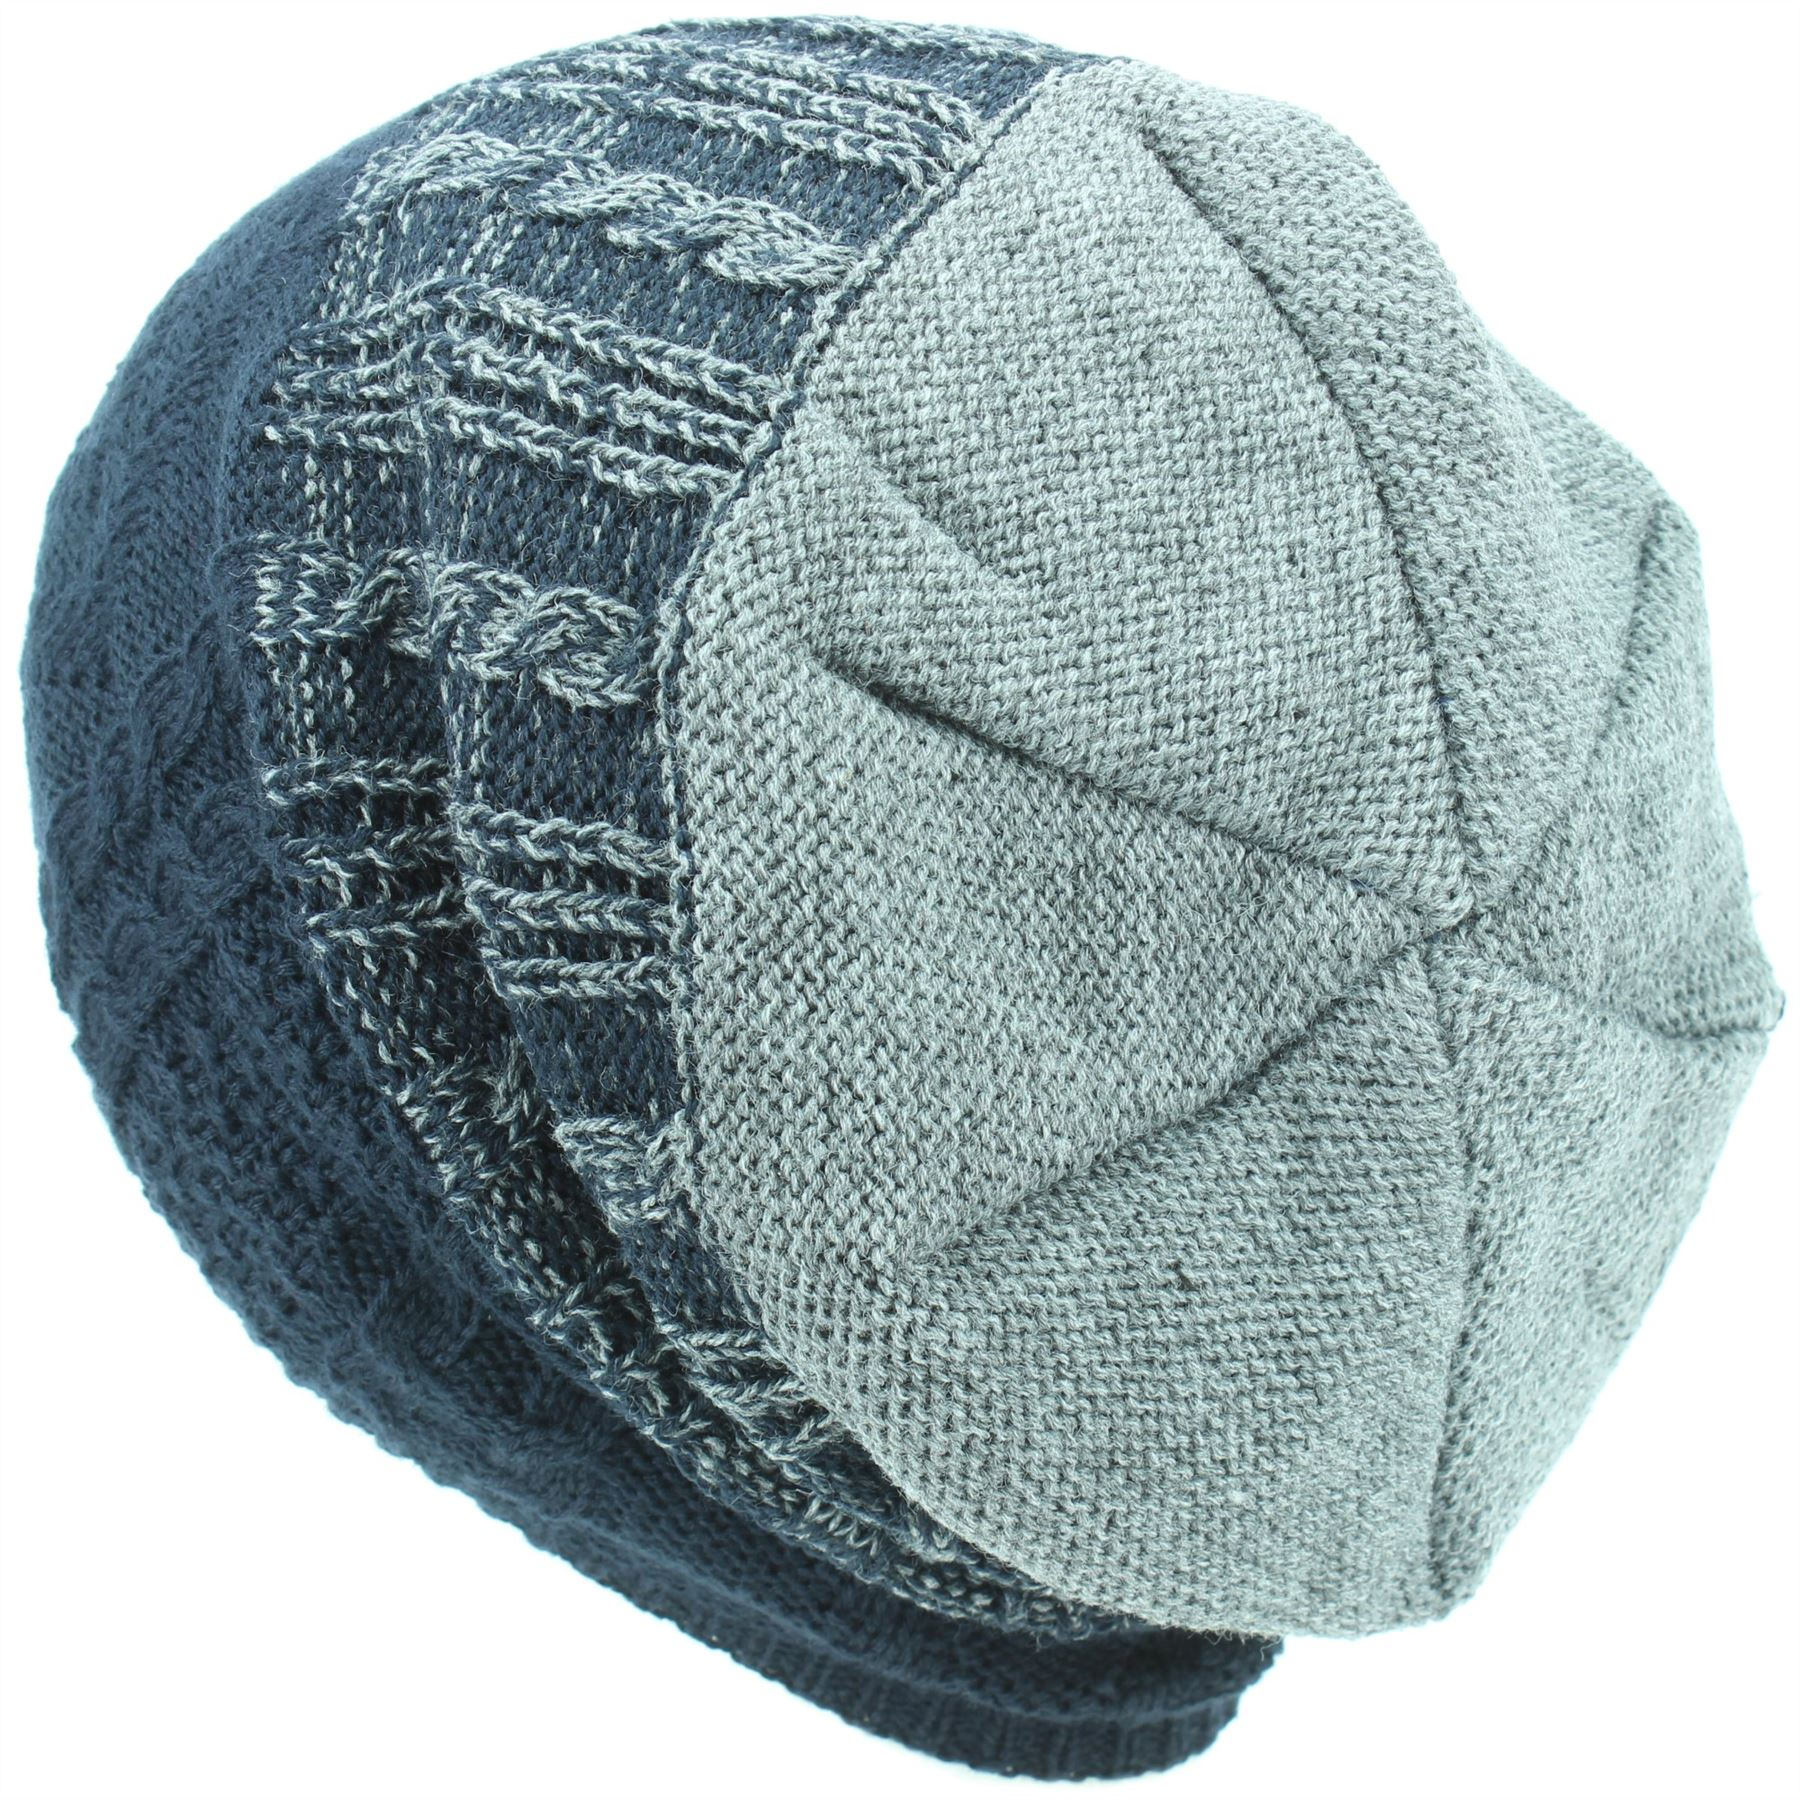 Beanie Hat Wool Knit Baggy Slouch BOHEMIA SWEDEN Winter Warm Lined